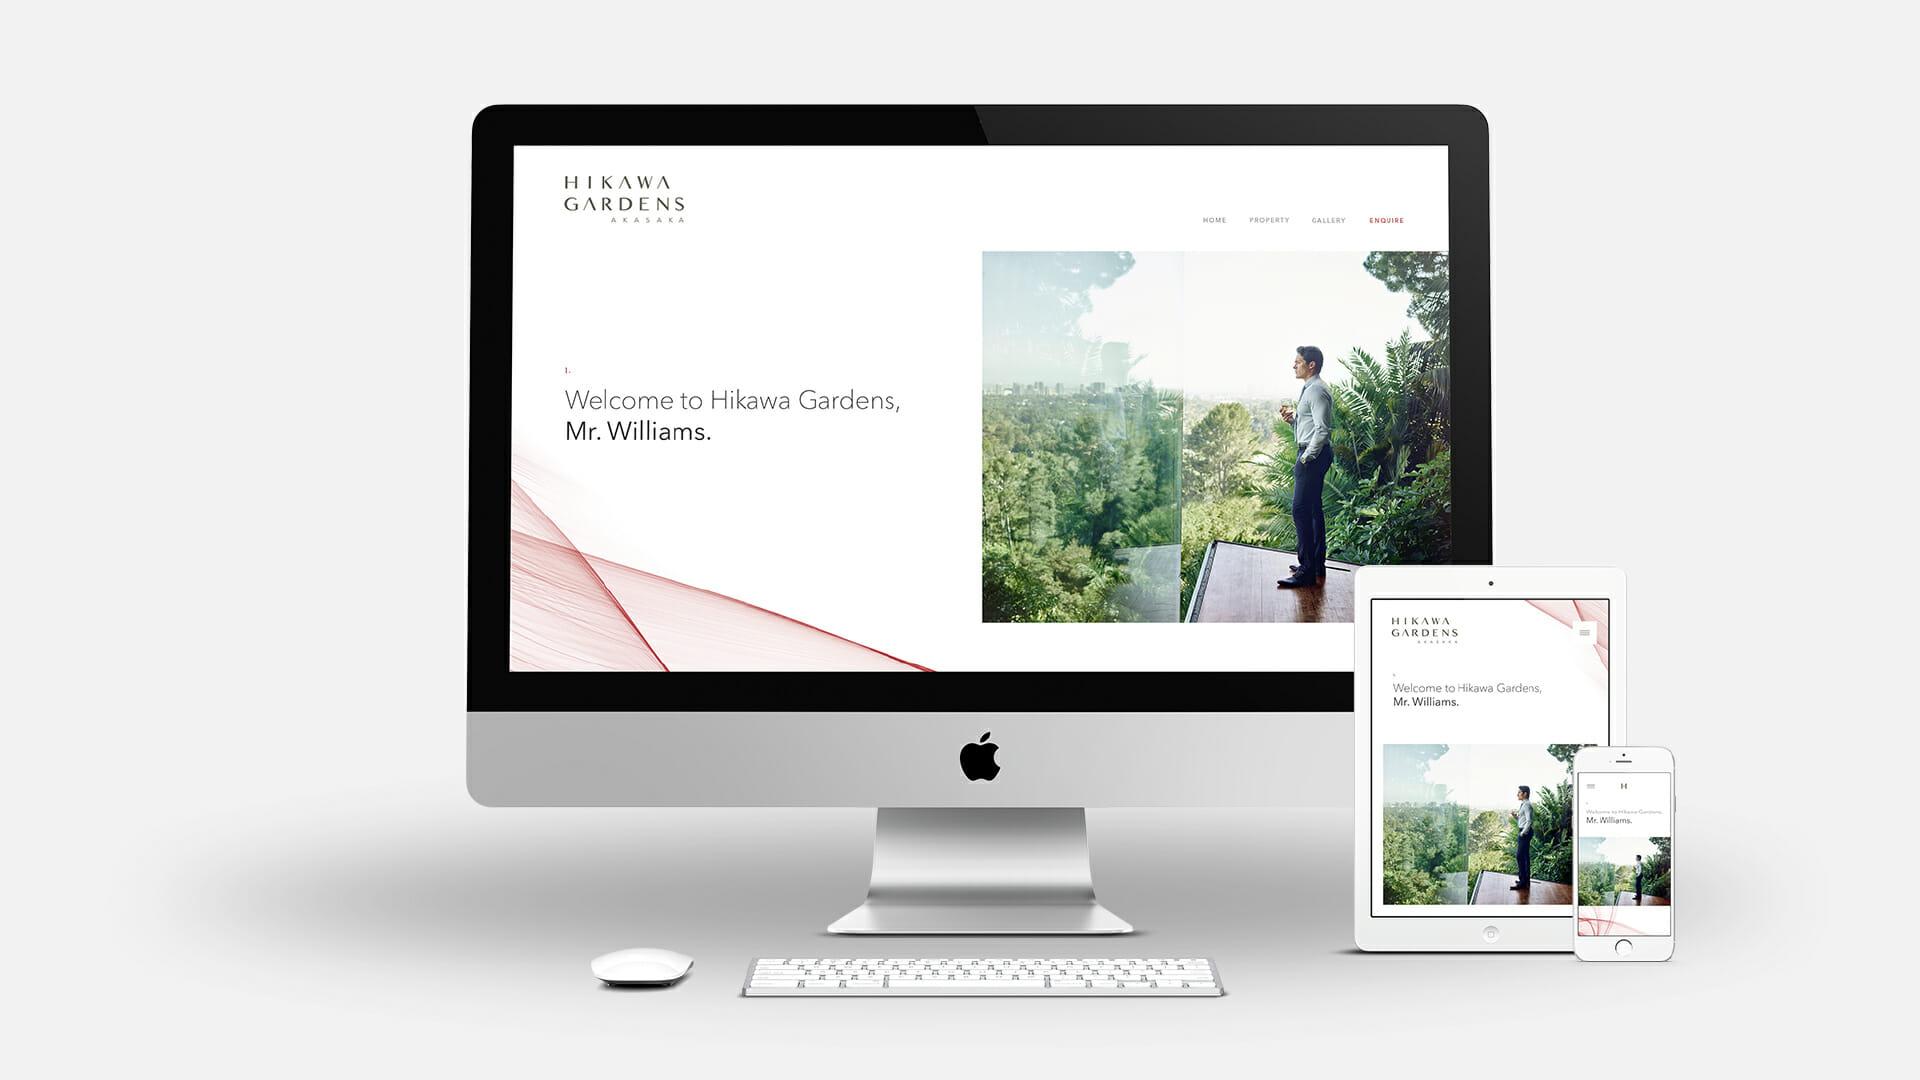 Hikawa Gardens | Luxury Residences Tokyo | Japan | Luxury Resort & Residential Marketing | Kingsland Linassi